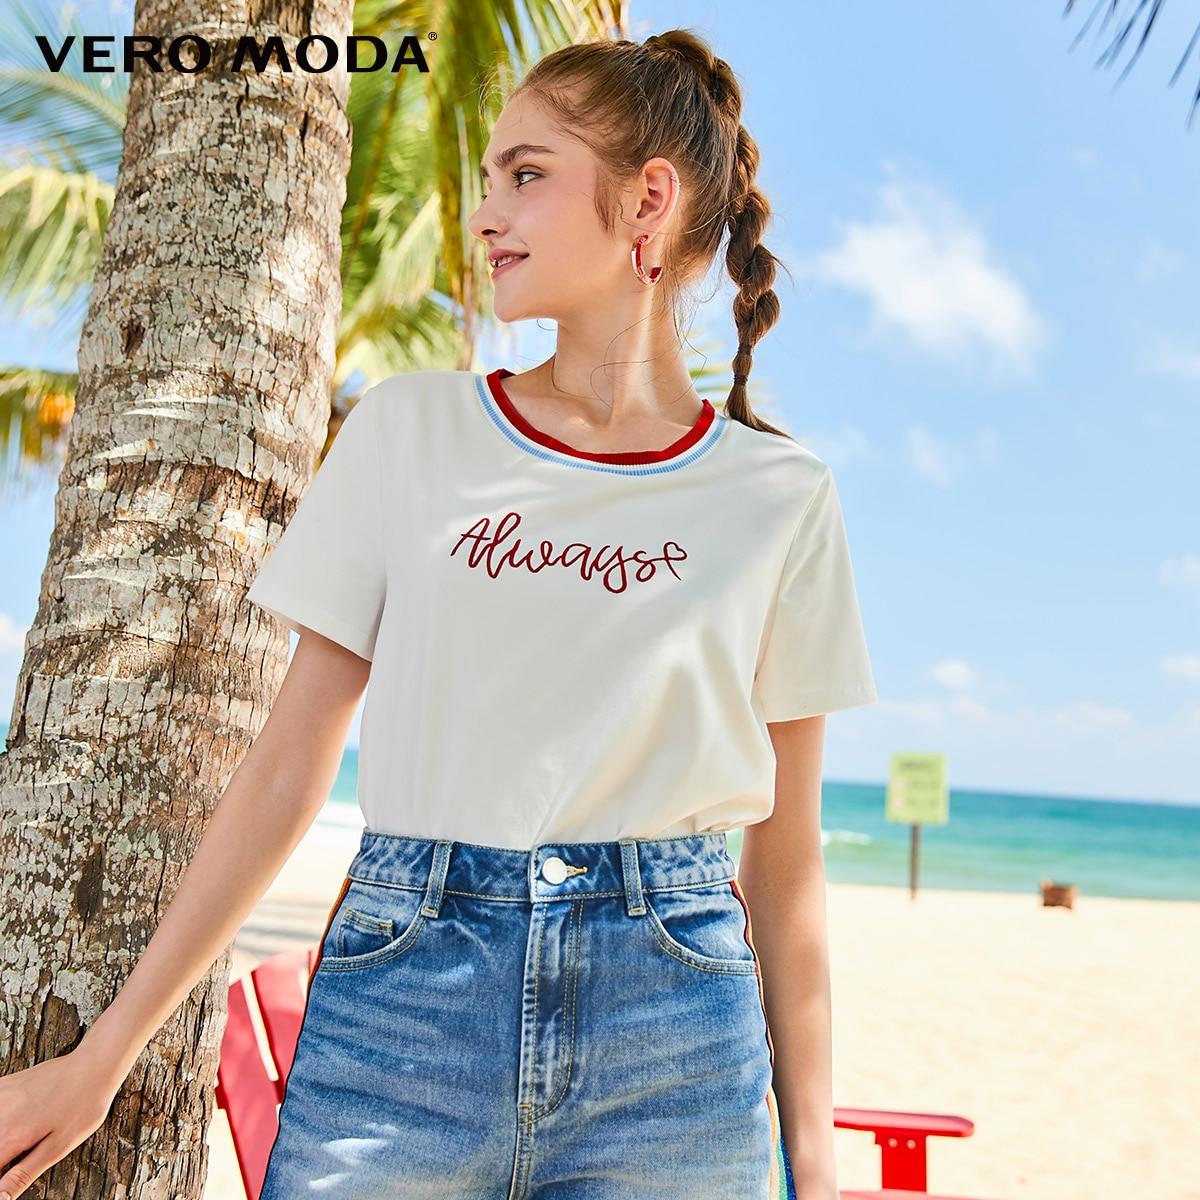 Vero Moda Womens Cotton Letter Print Round Neckline Assorted Colors Casul T-shirt   319101505